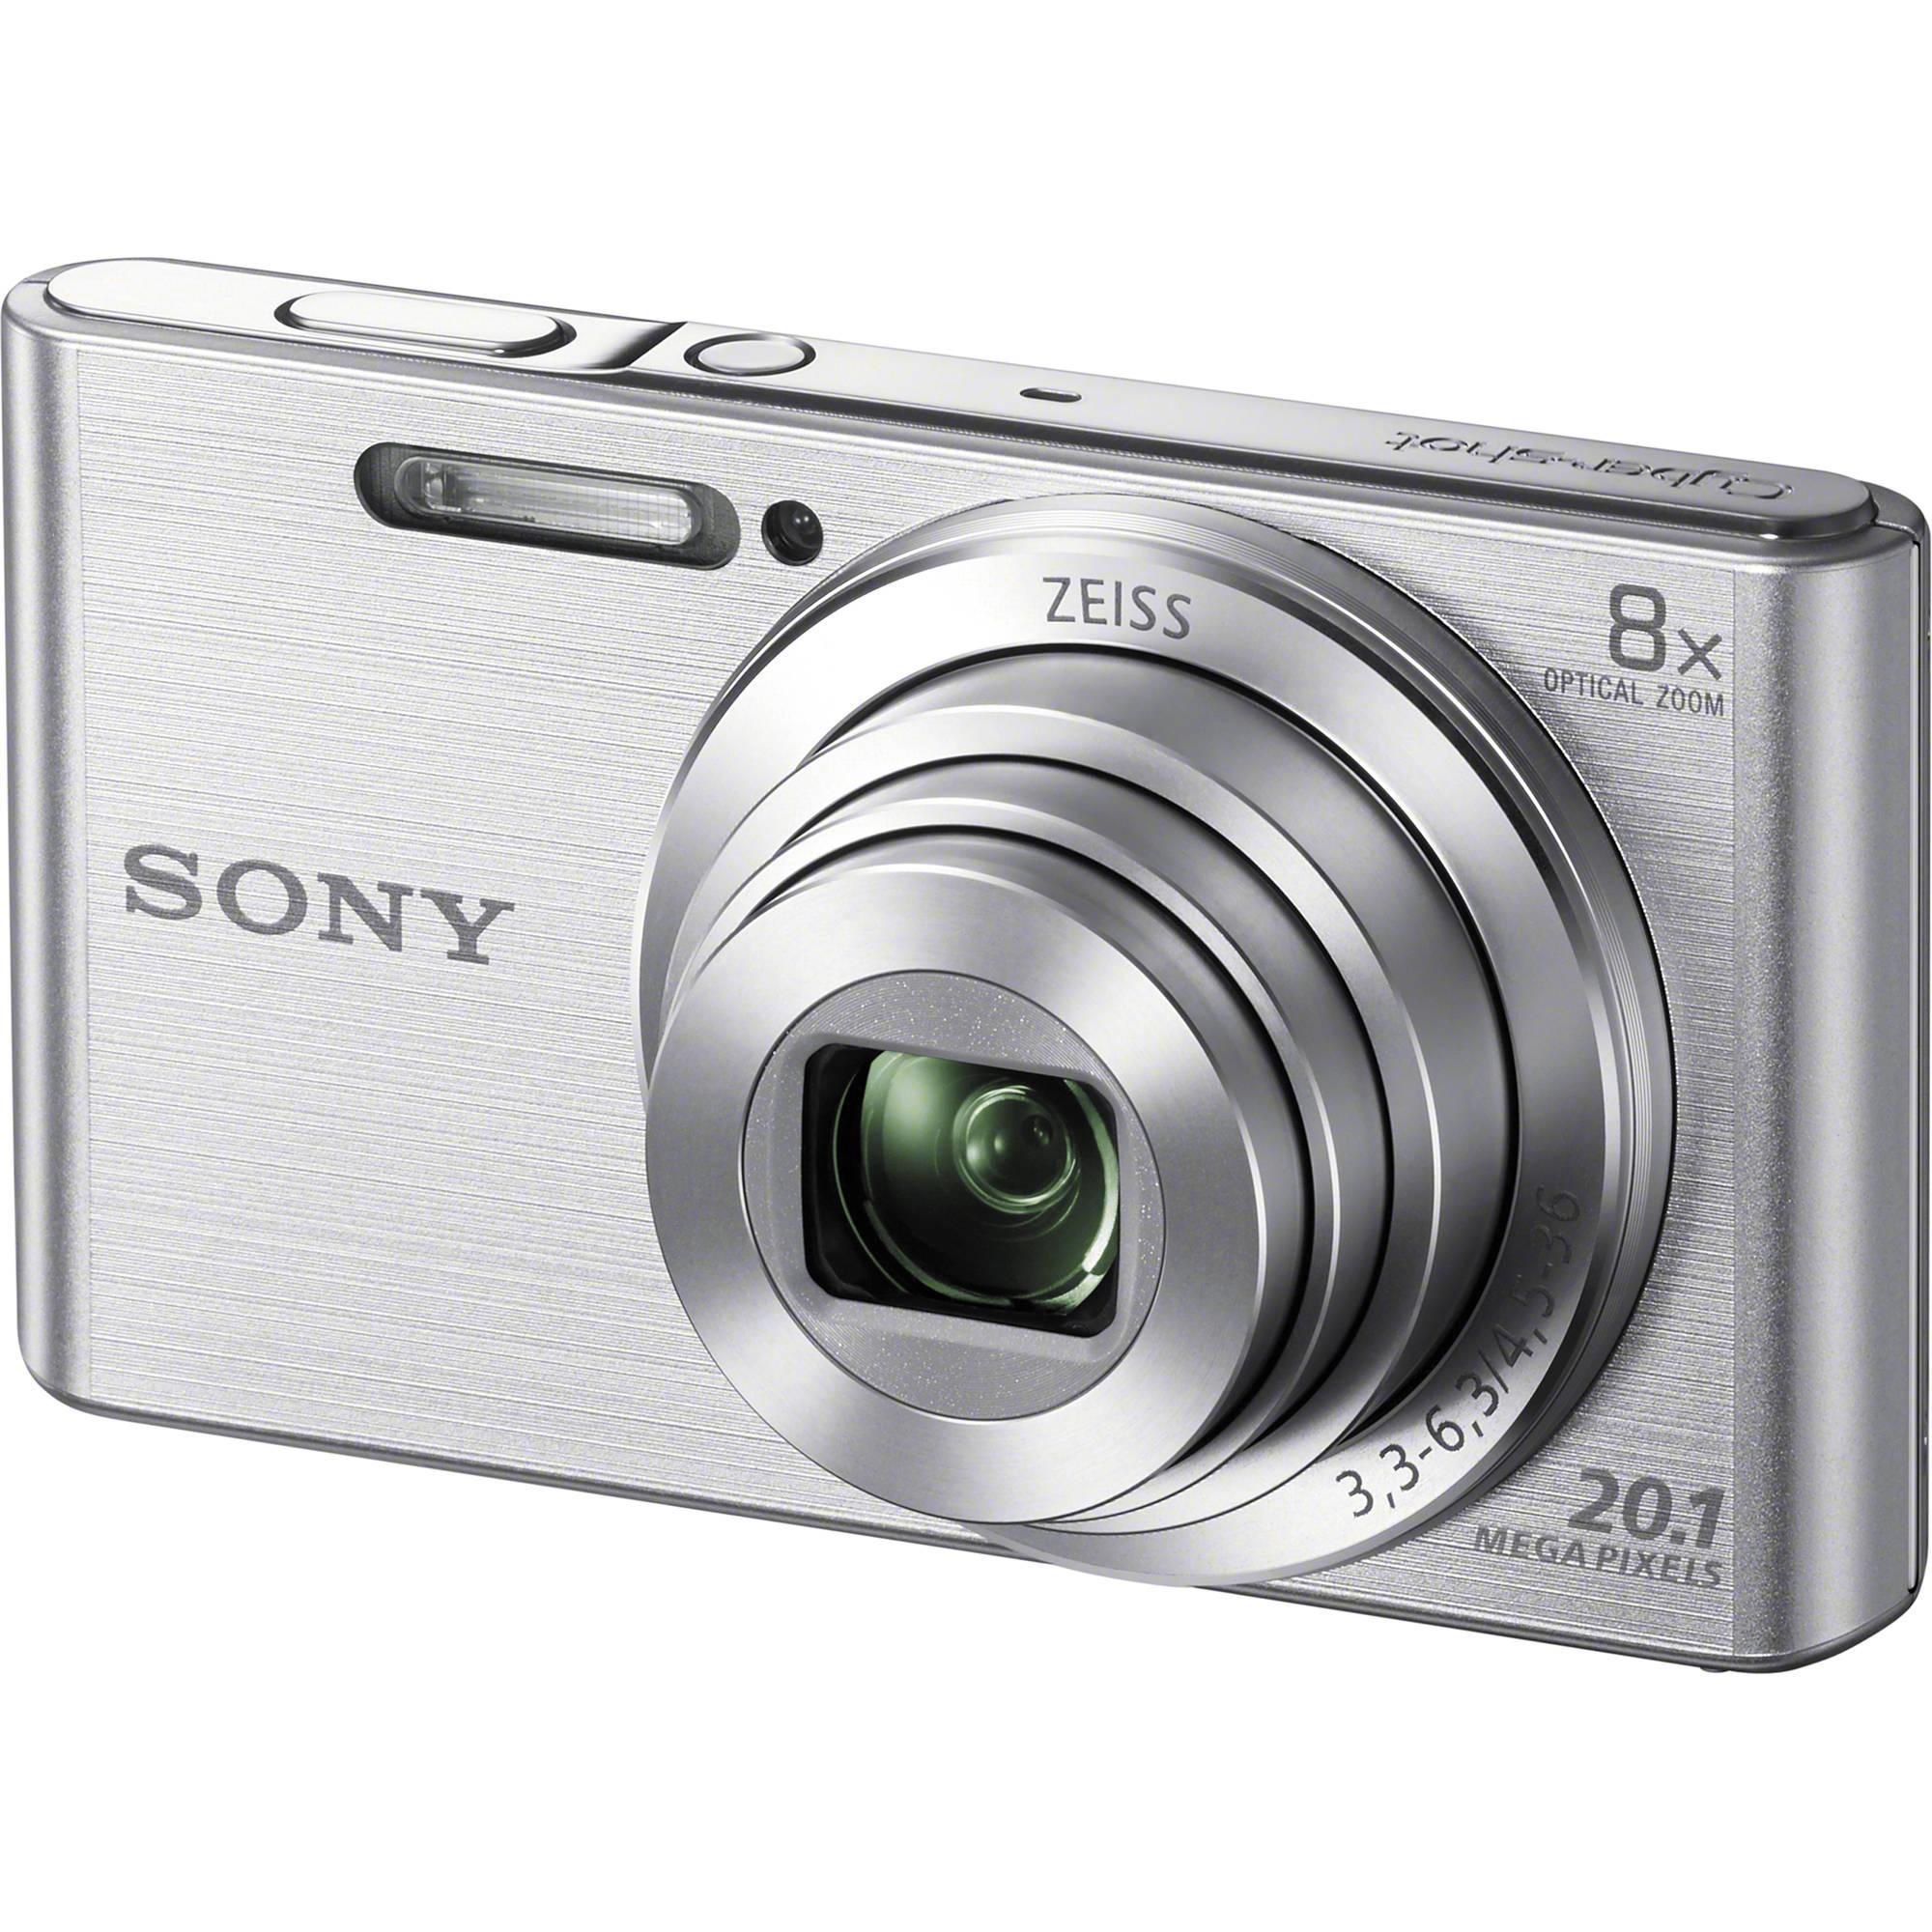 Offer tại Lazada cho Máy ảnh Sony Cybershot DSC-W830 Bạc